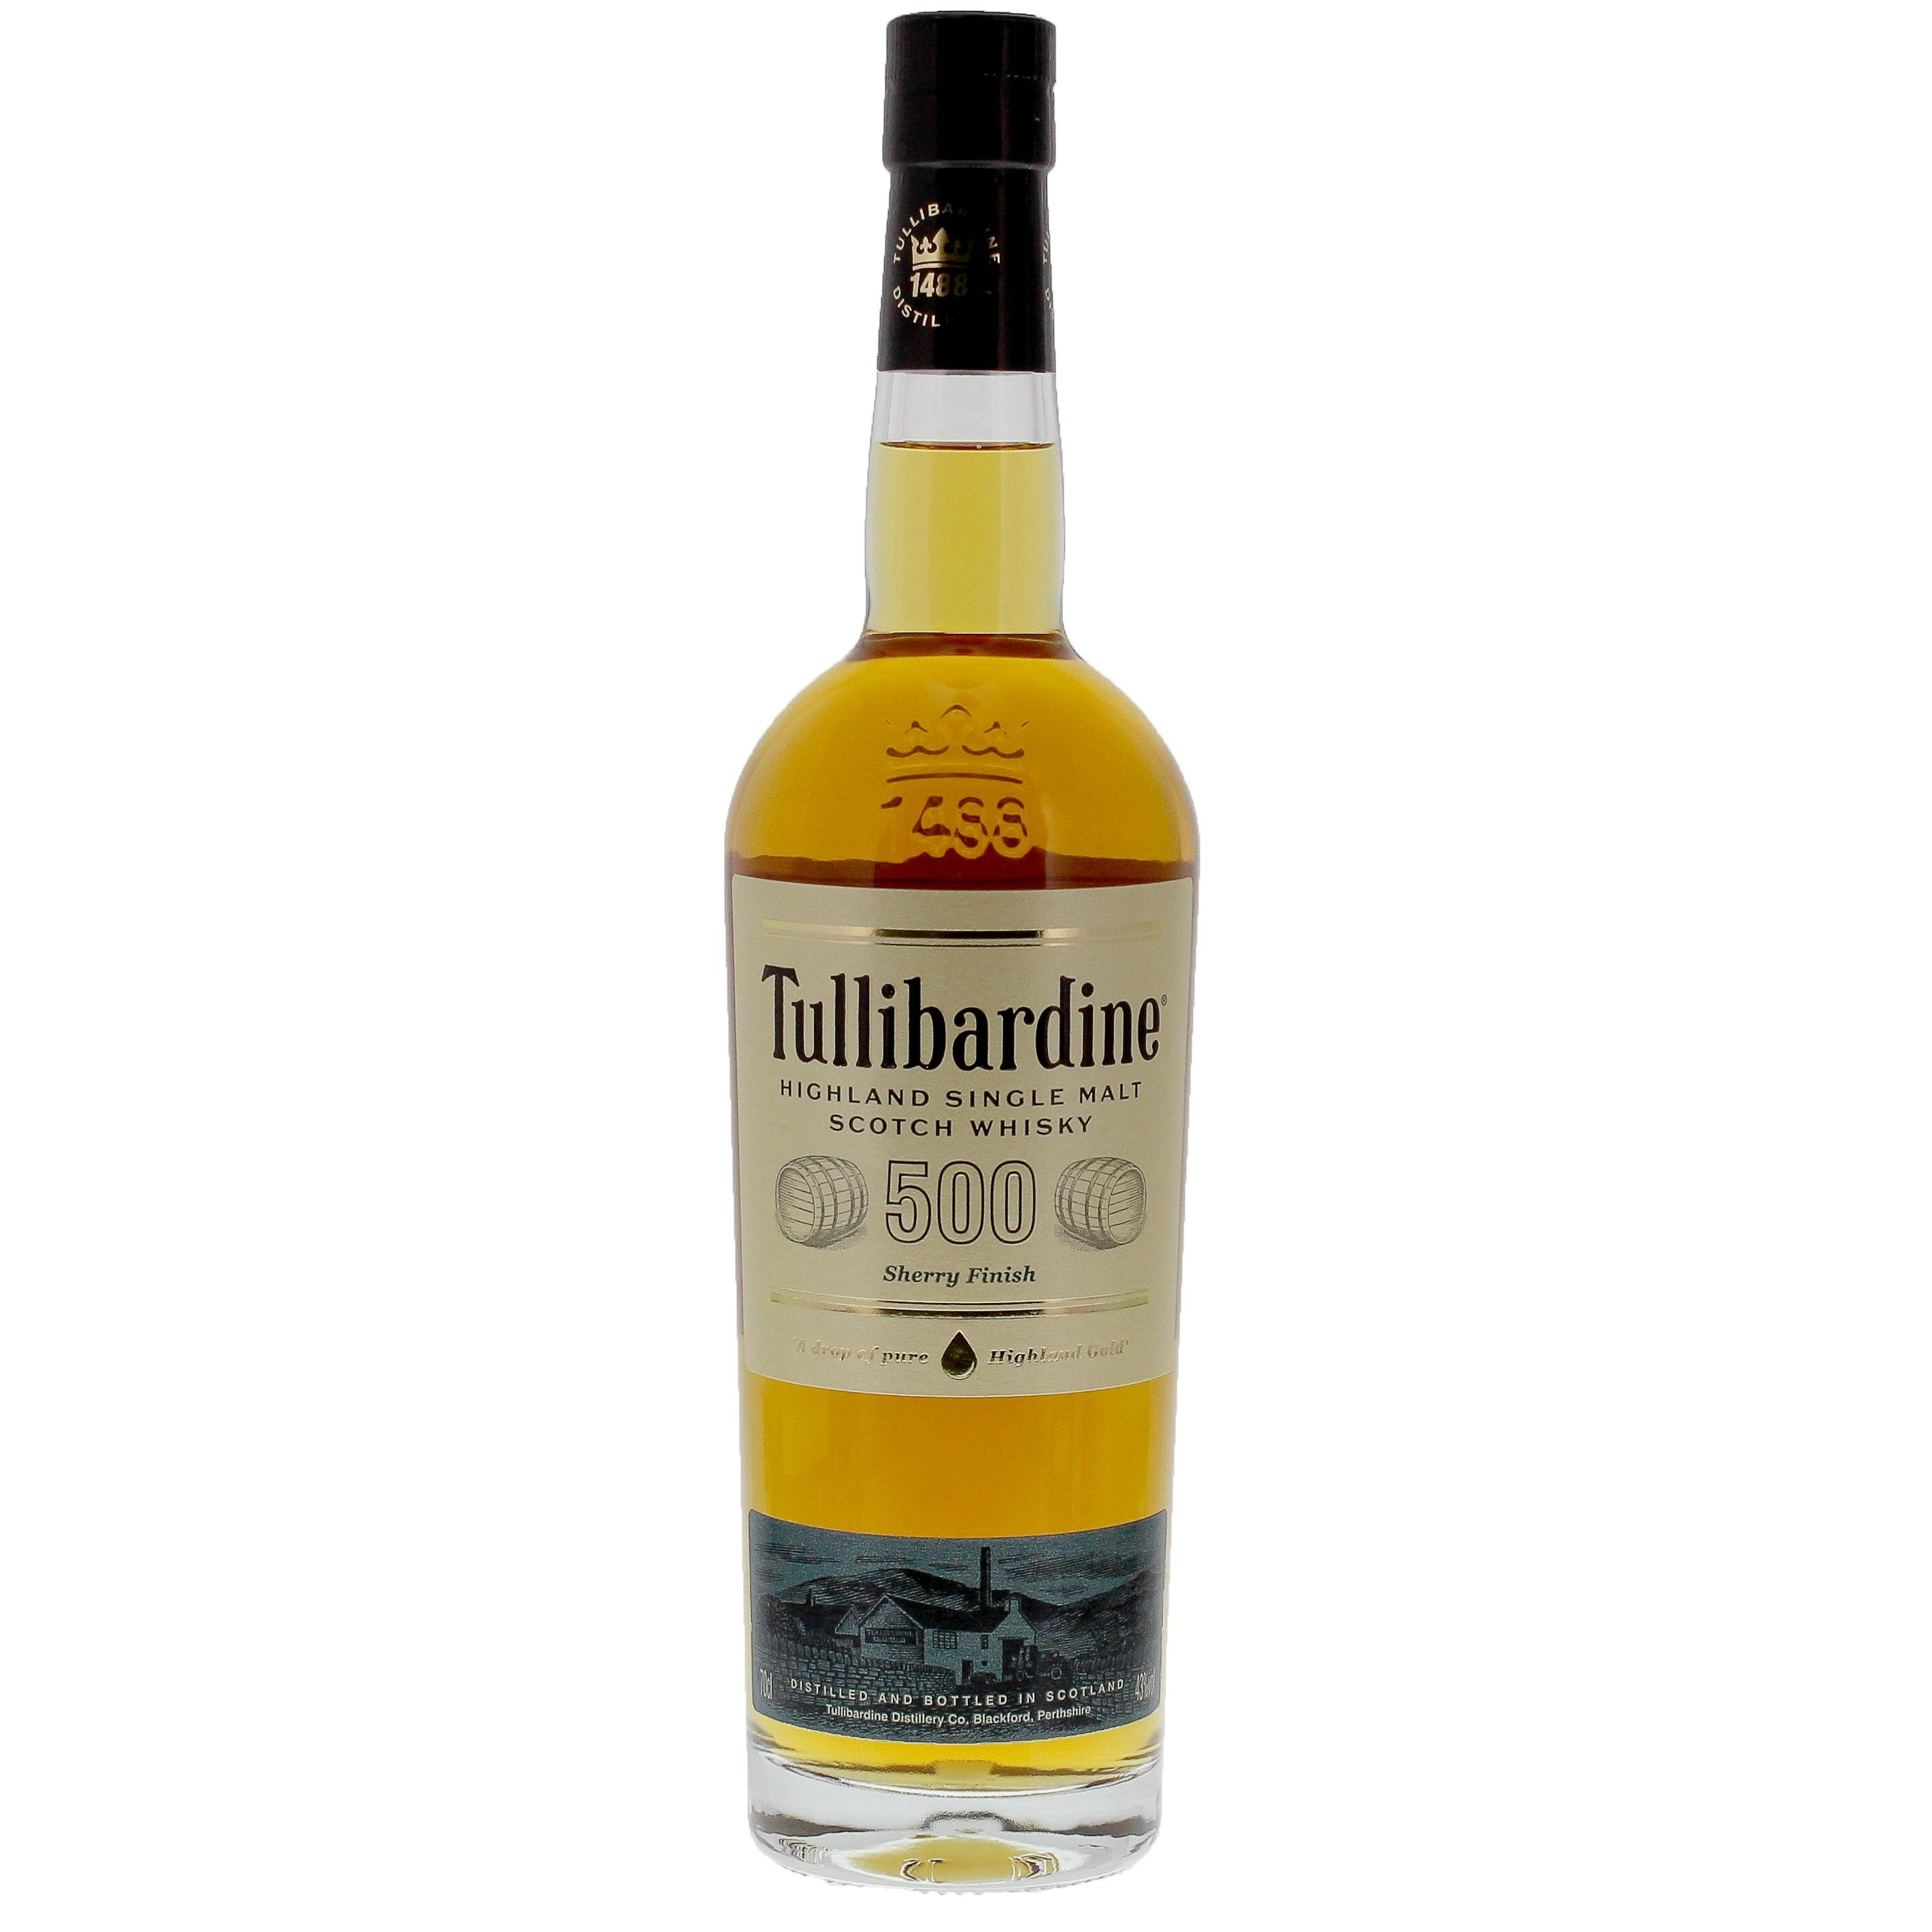 Tullibardine Single Malt Scotch Whisky 500 Sherry Finish 0,7l